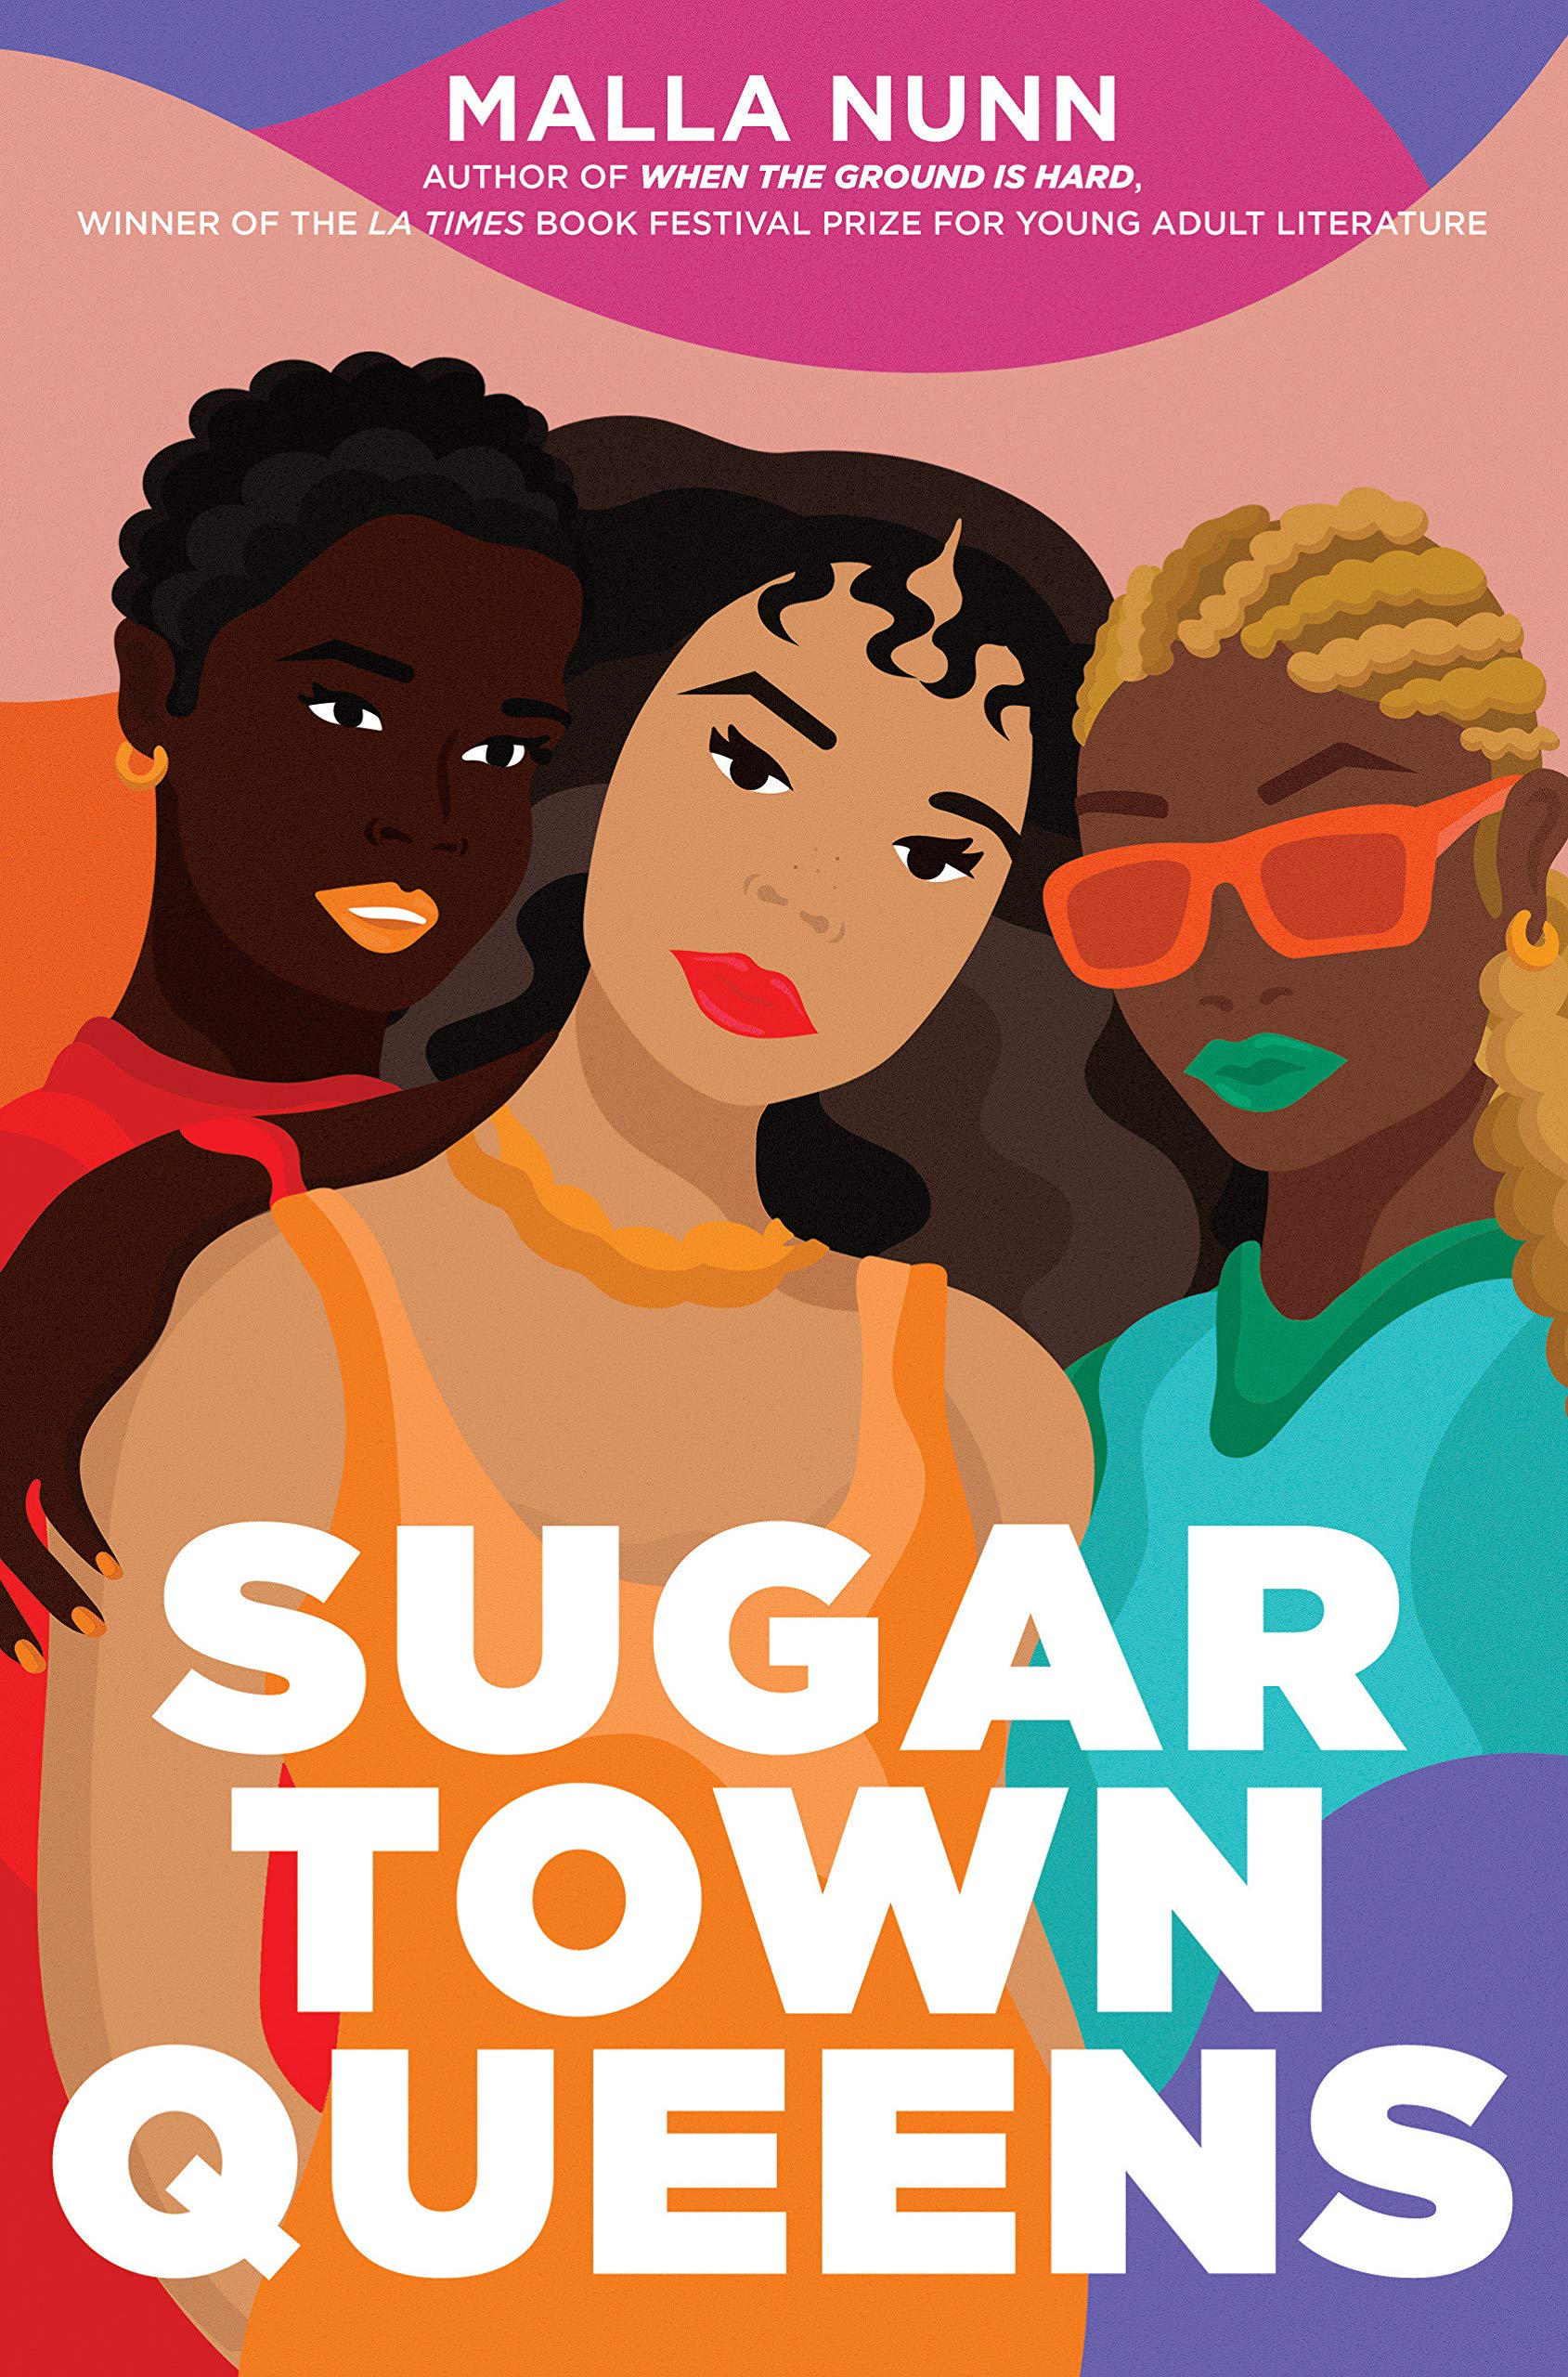 Sugar Town Queens book cover